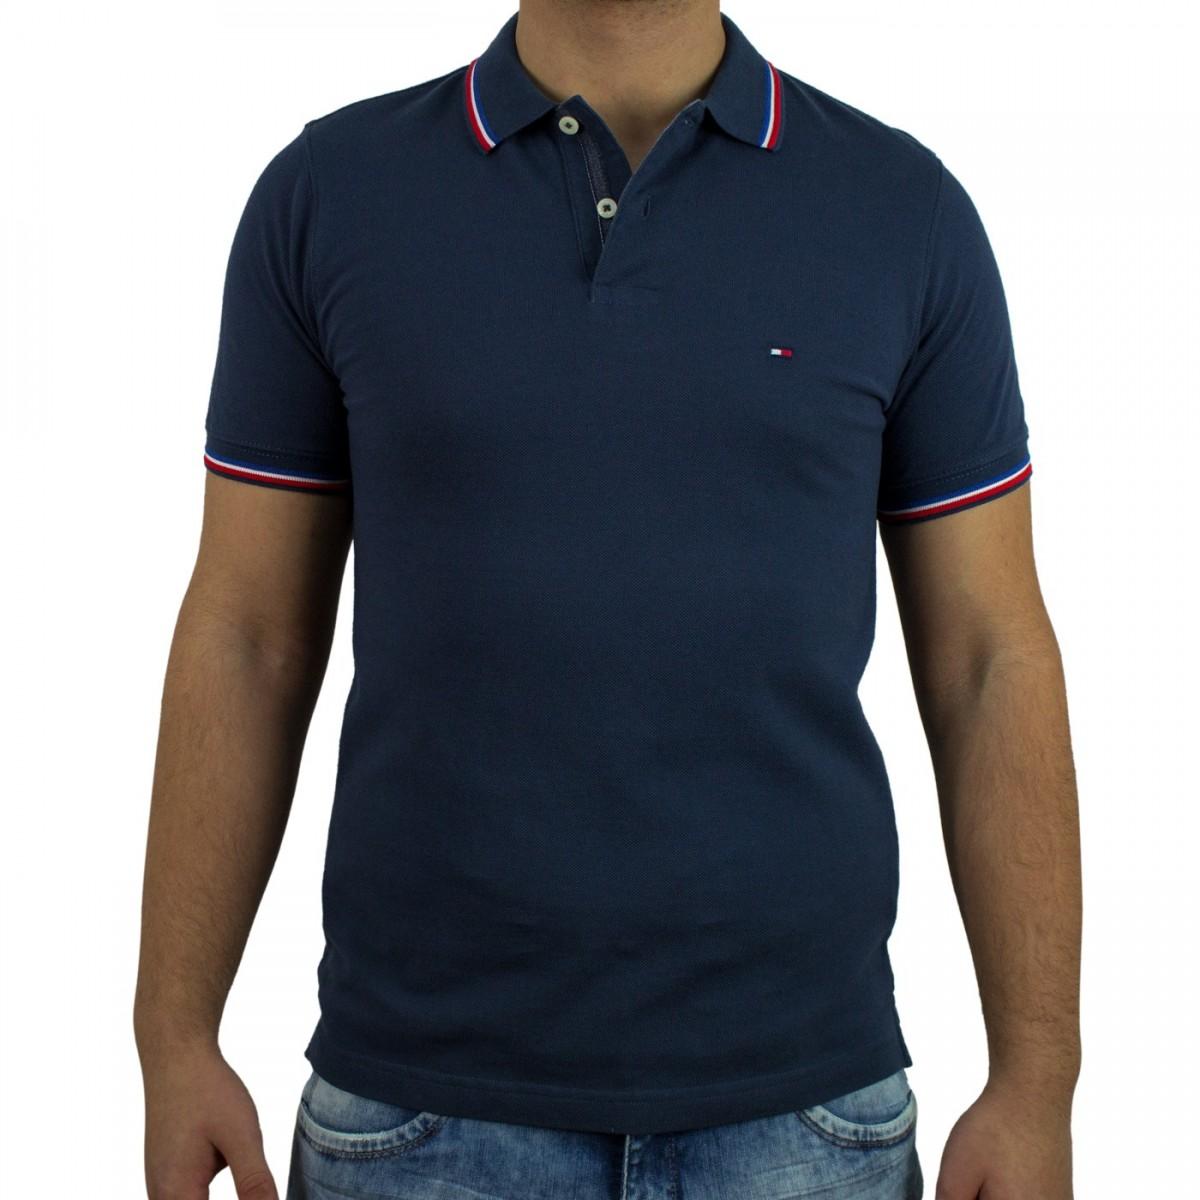 6266382e2 Bizz Store - Camisa Polo Masculina Tommy Hilfiger Marinho Slim